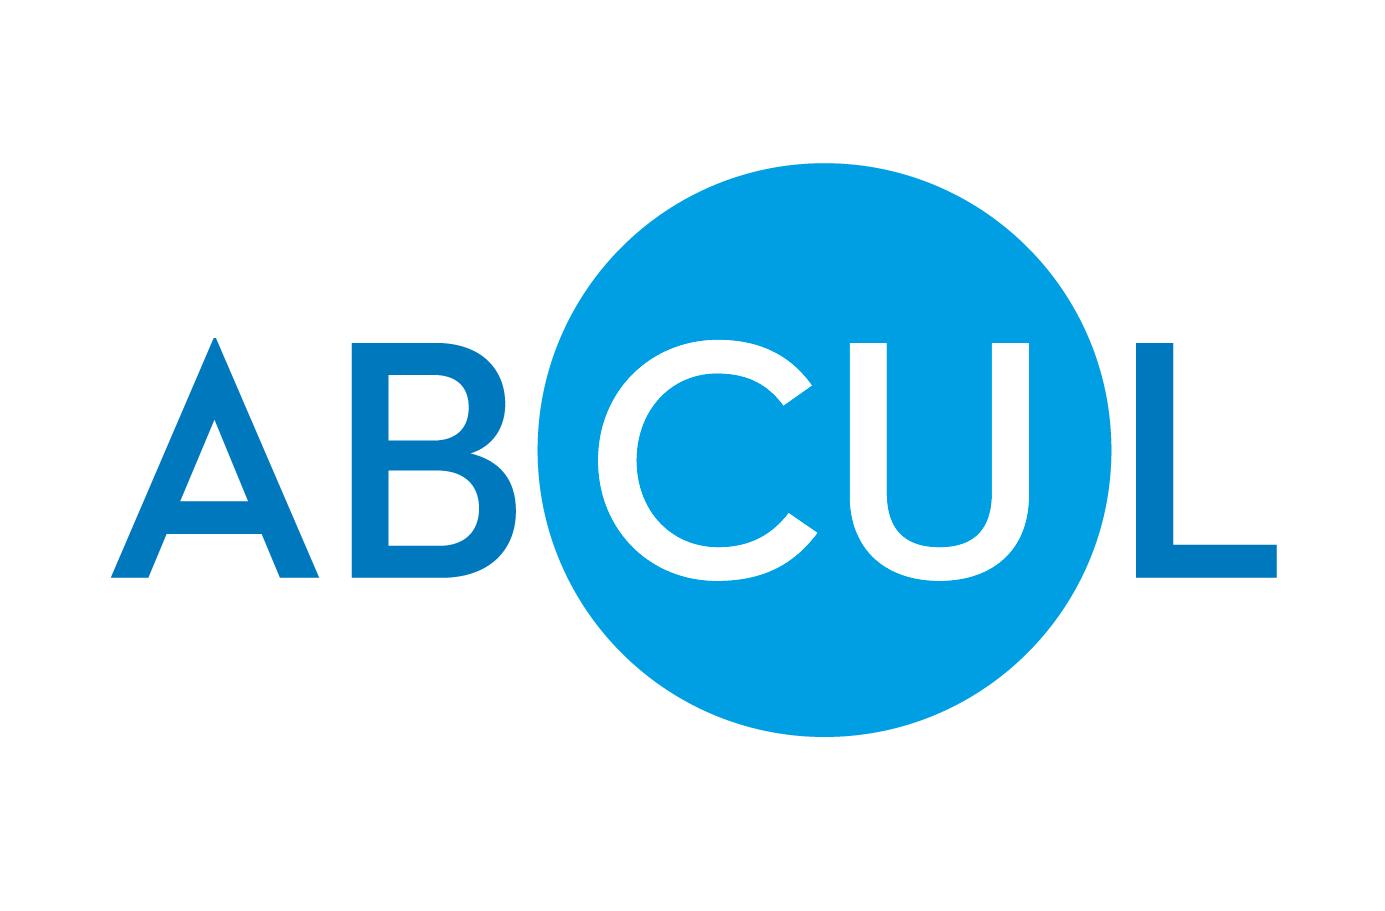 ABCUL logo